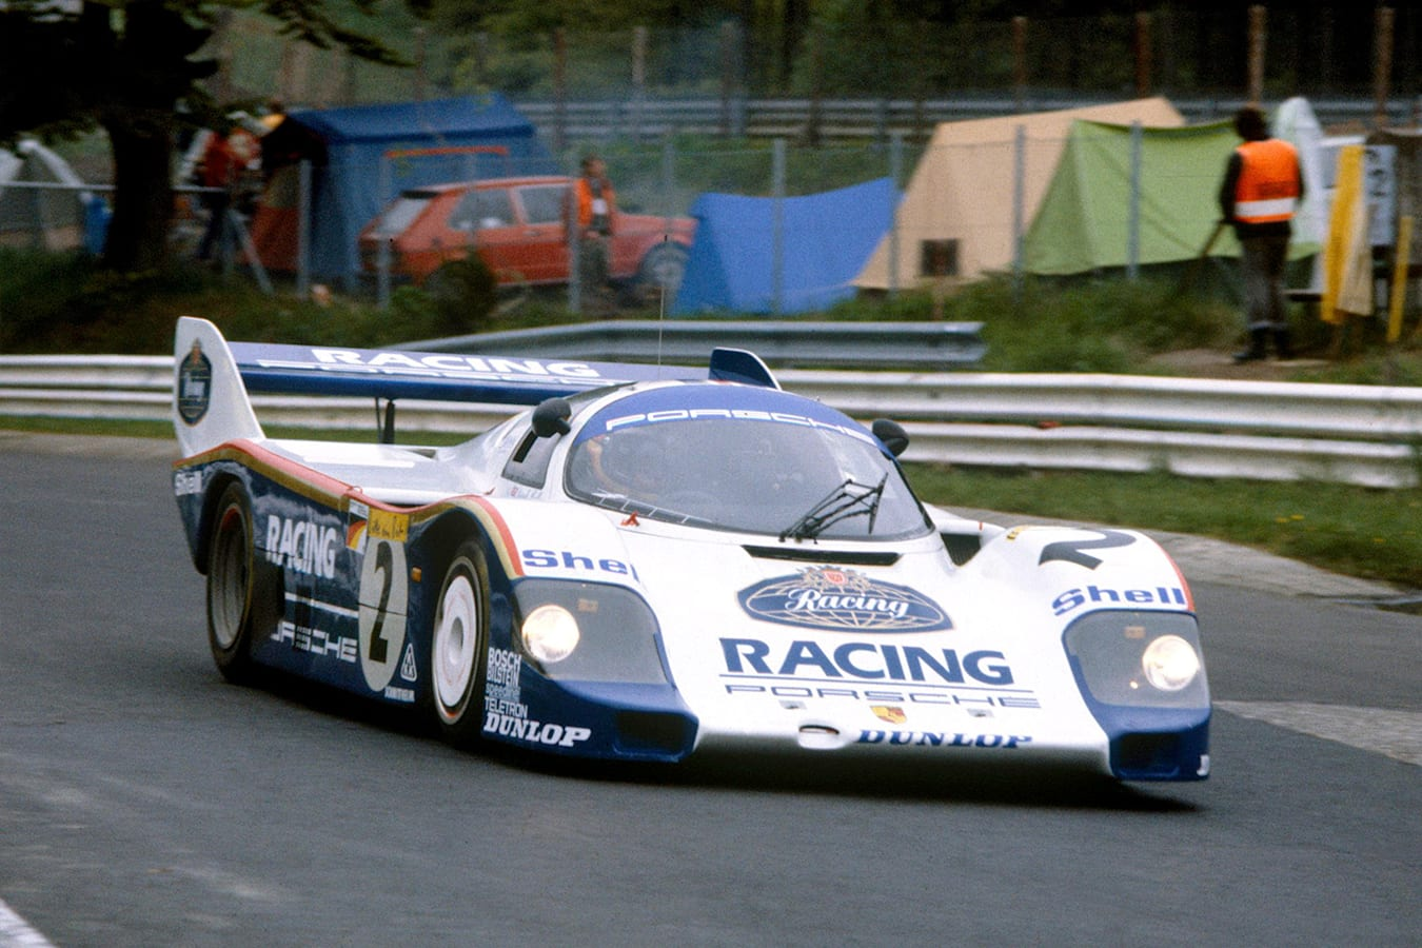 Stefan Bellof Nurburgring Record Porsche 956 Jpg